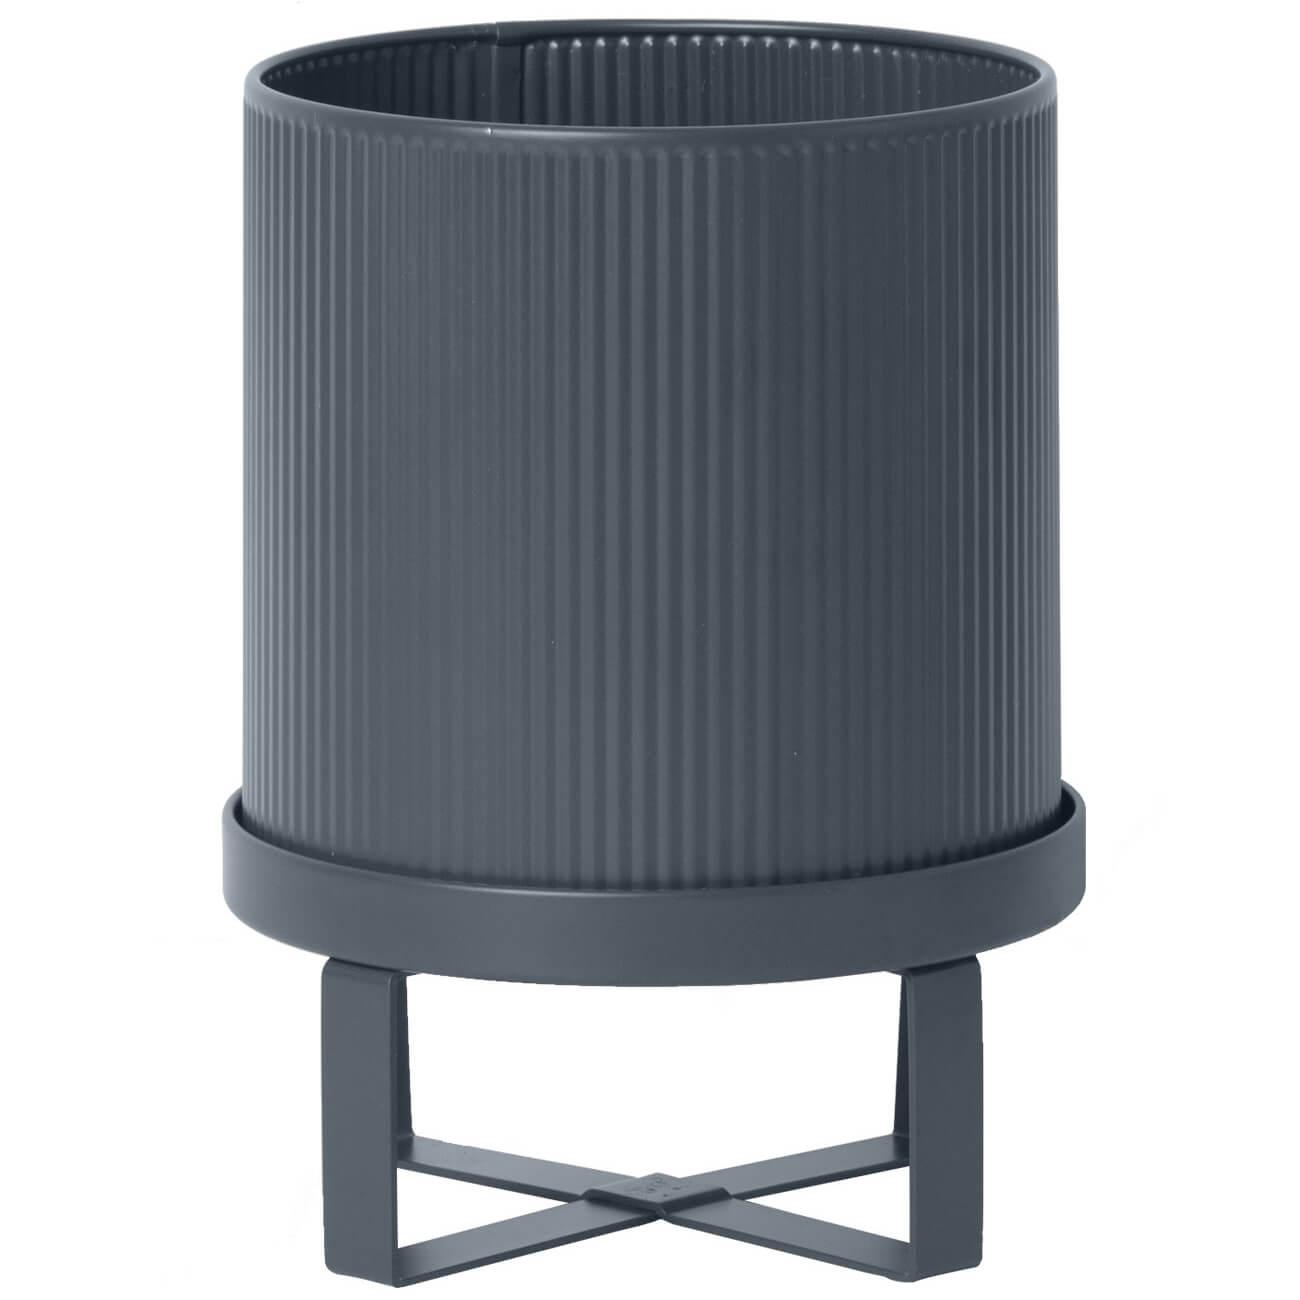 Ferm Living Bau Pot - Small - Dark Blue